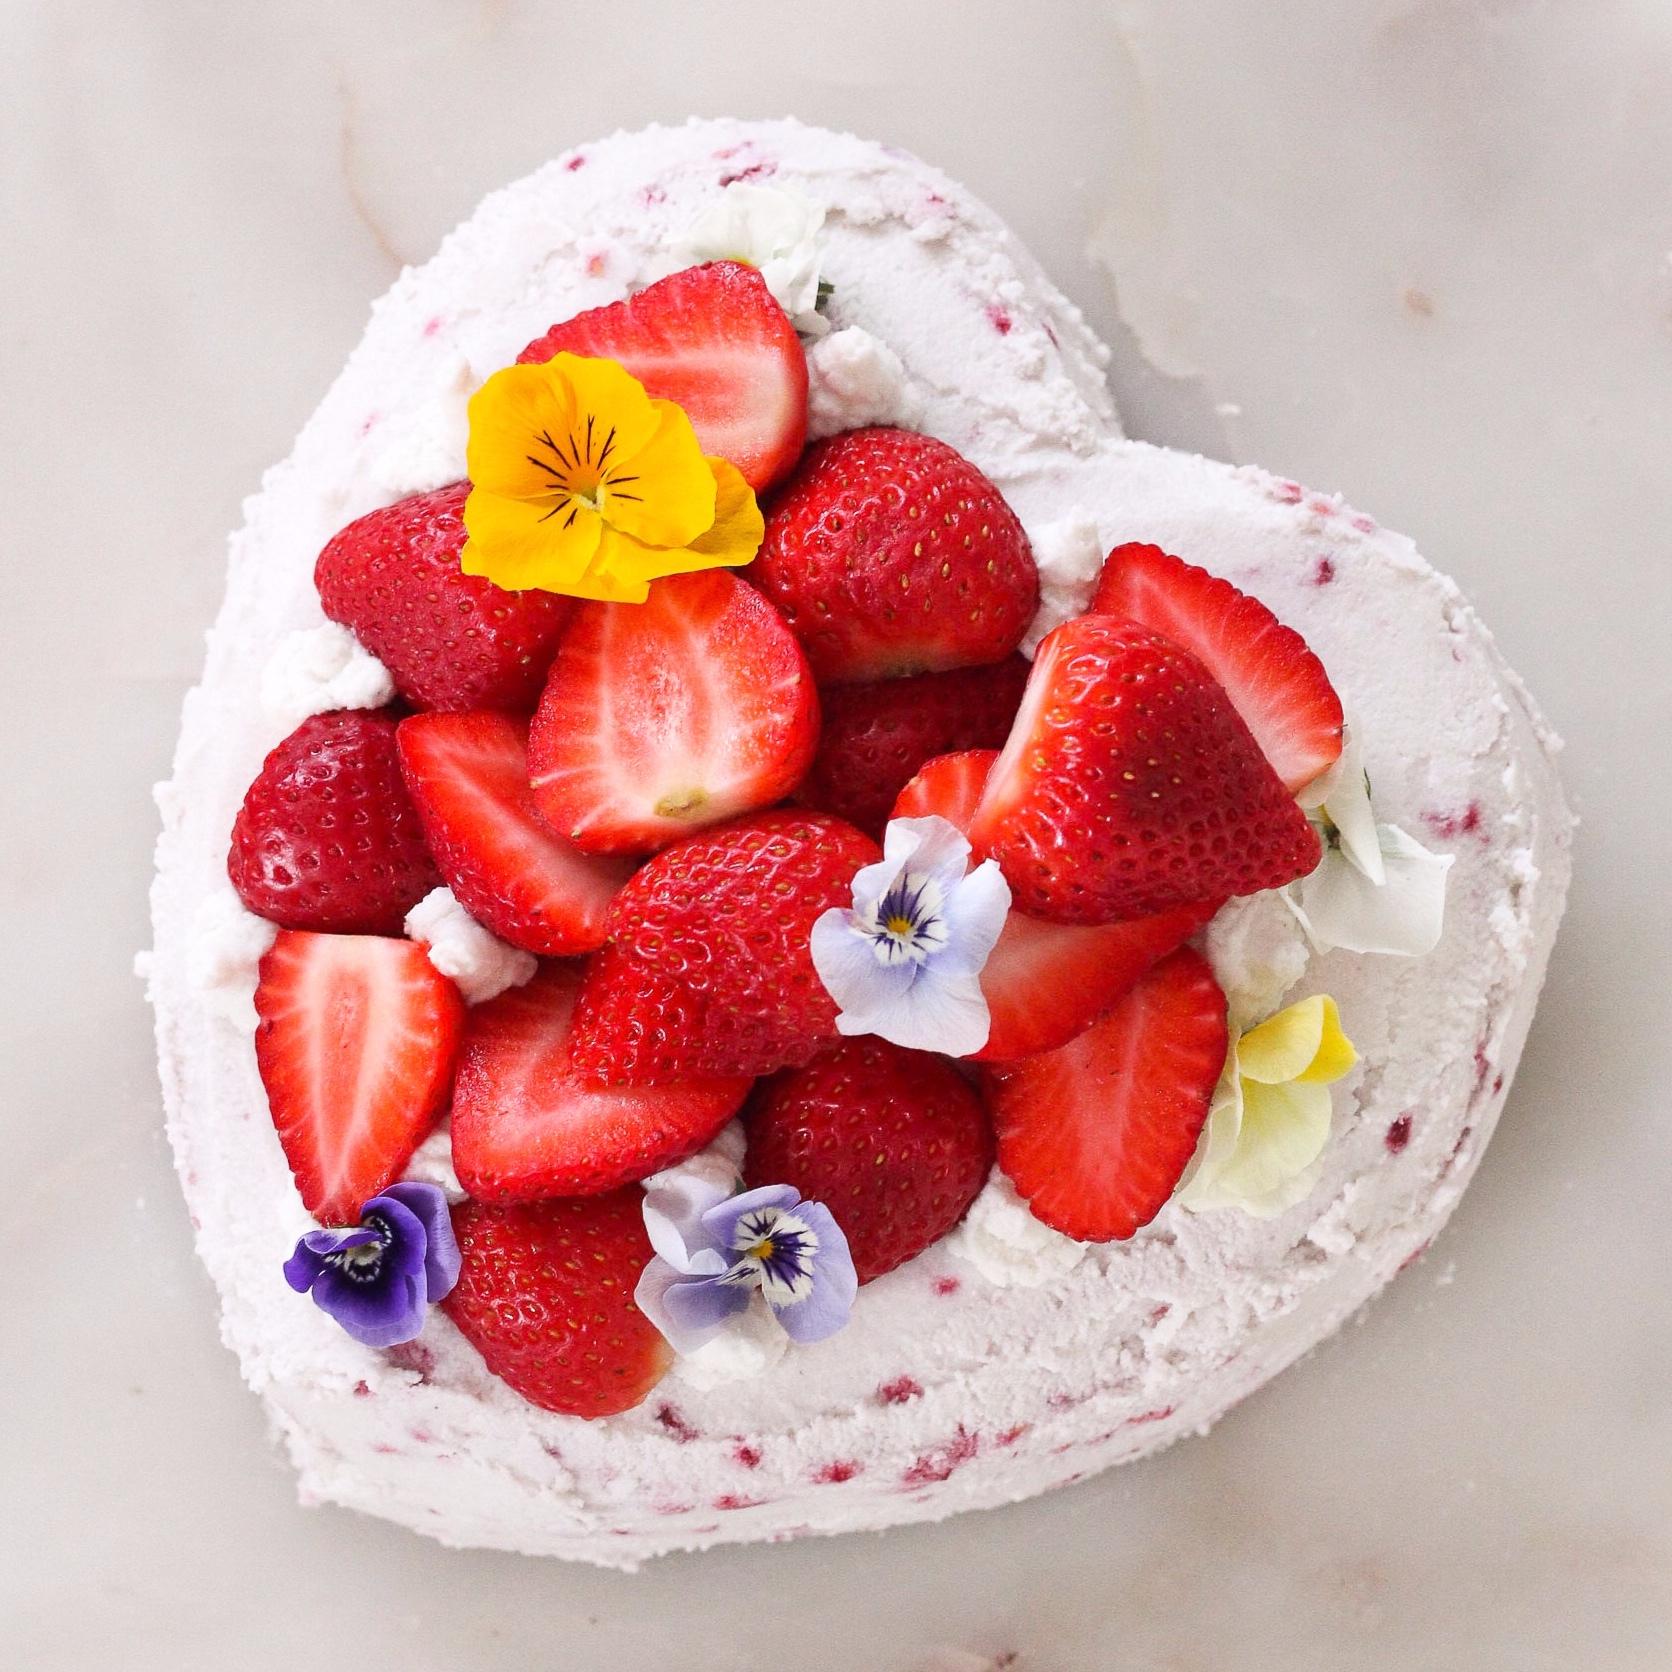 Strawberry Shortcake. Fluffy macadamia crust. Macadamia coconut yoghurt cream. Young coconut meat frosting.